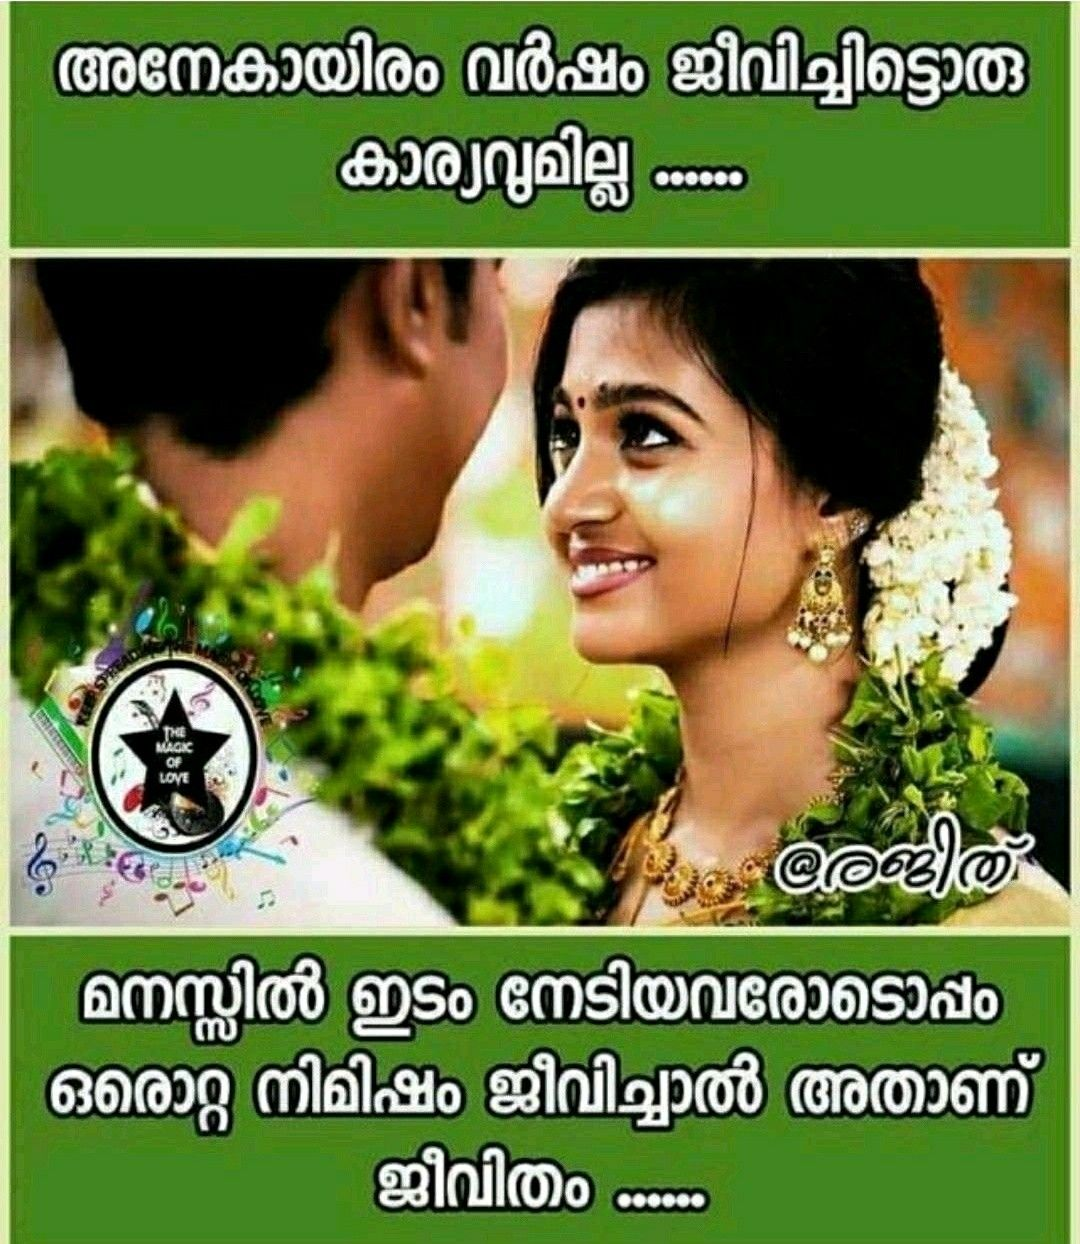 Pin by SruthyLakshmi on മലയാളം ചിന്തകൾ Malayalam quotes